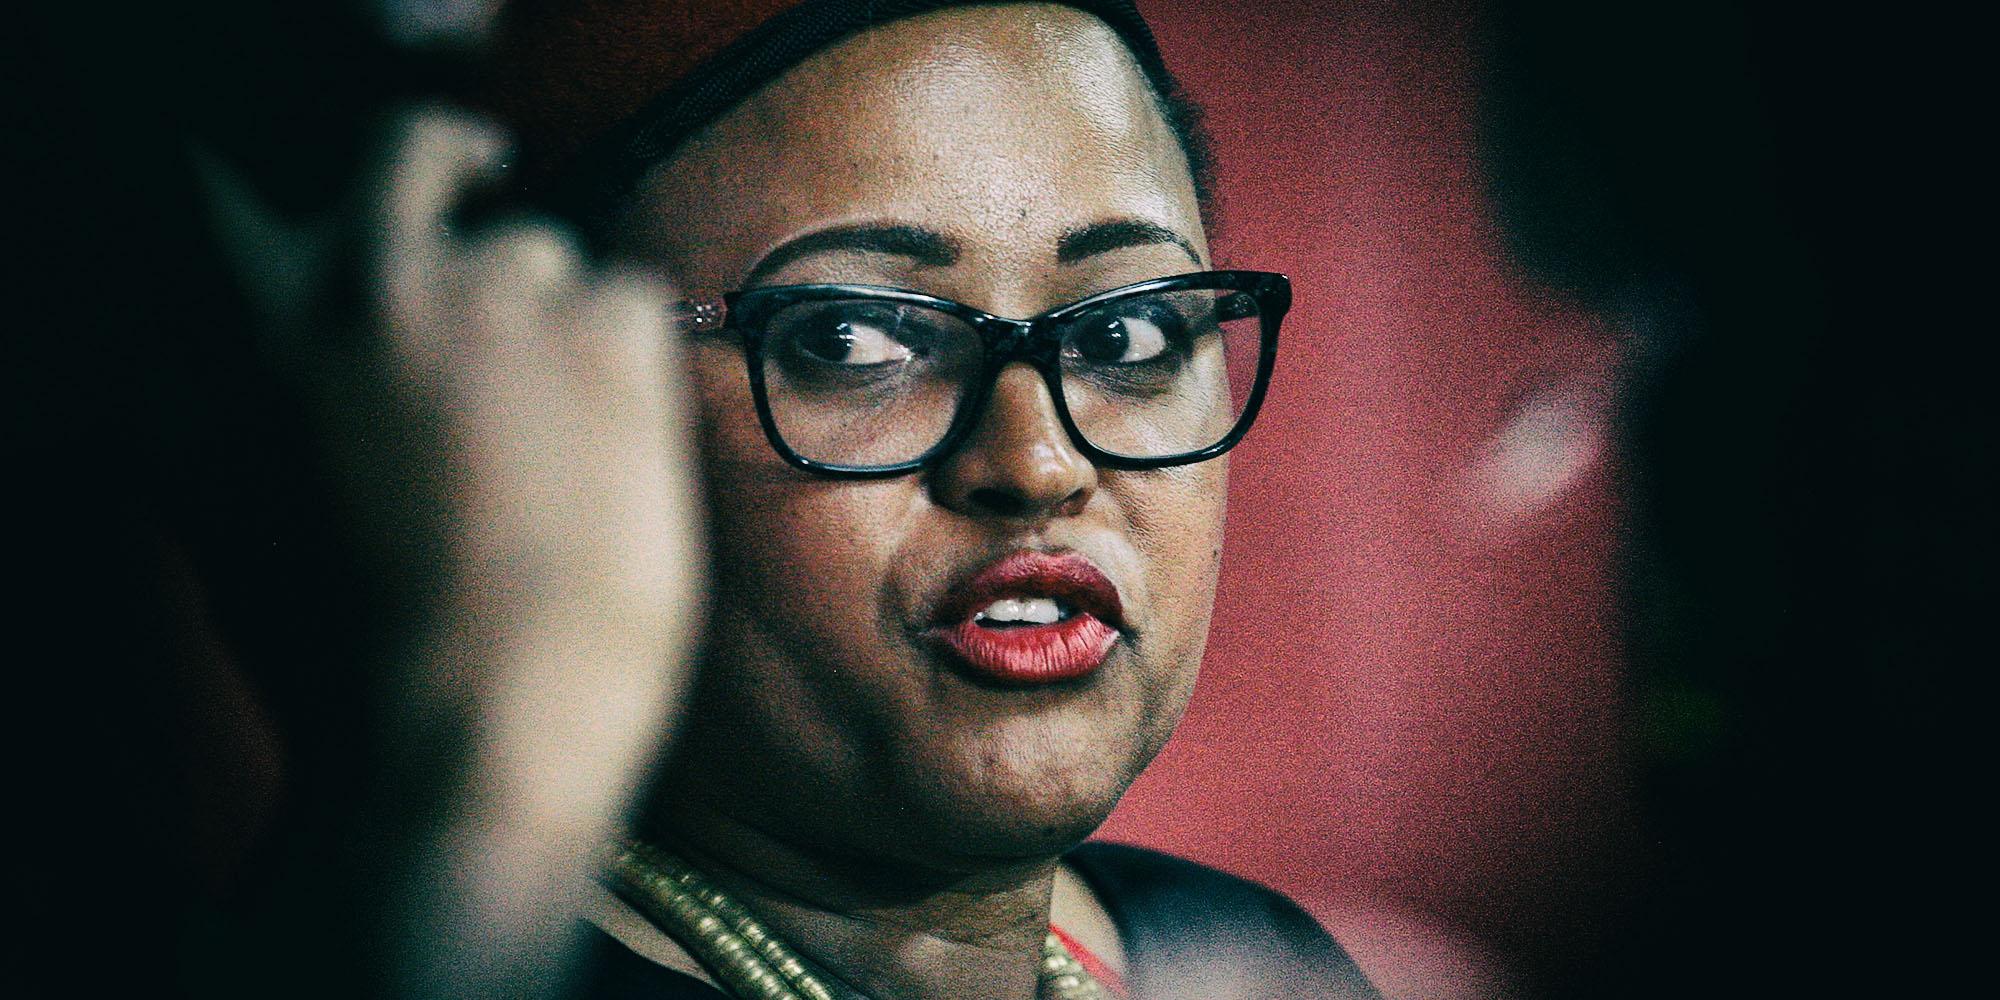 The political trajectory of EFF Gauteng leader Mandisa Mashego remains uncertain - Daily Maverick